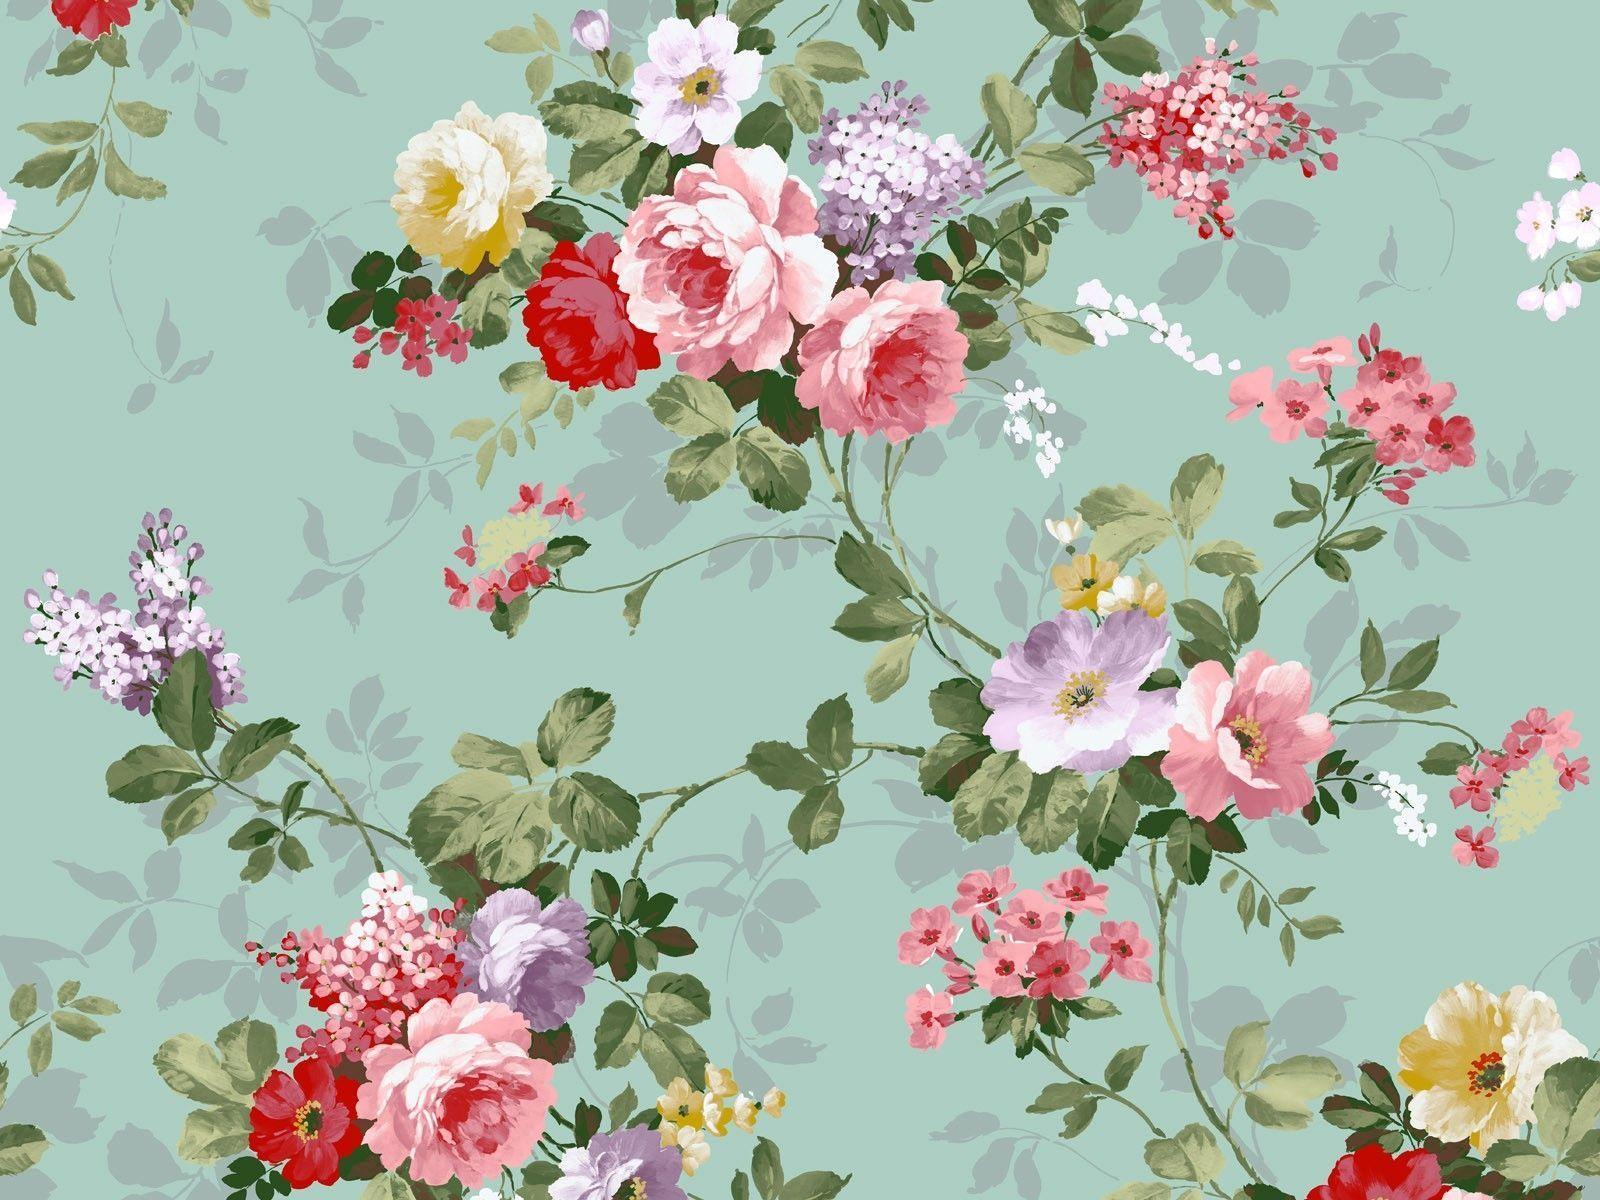 Indie Floral Wallpapers Top Free Indie Floral Backgrounds